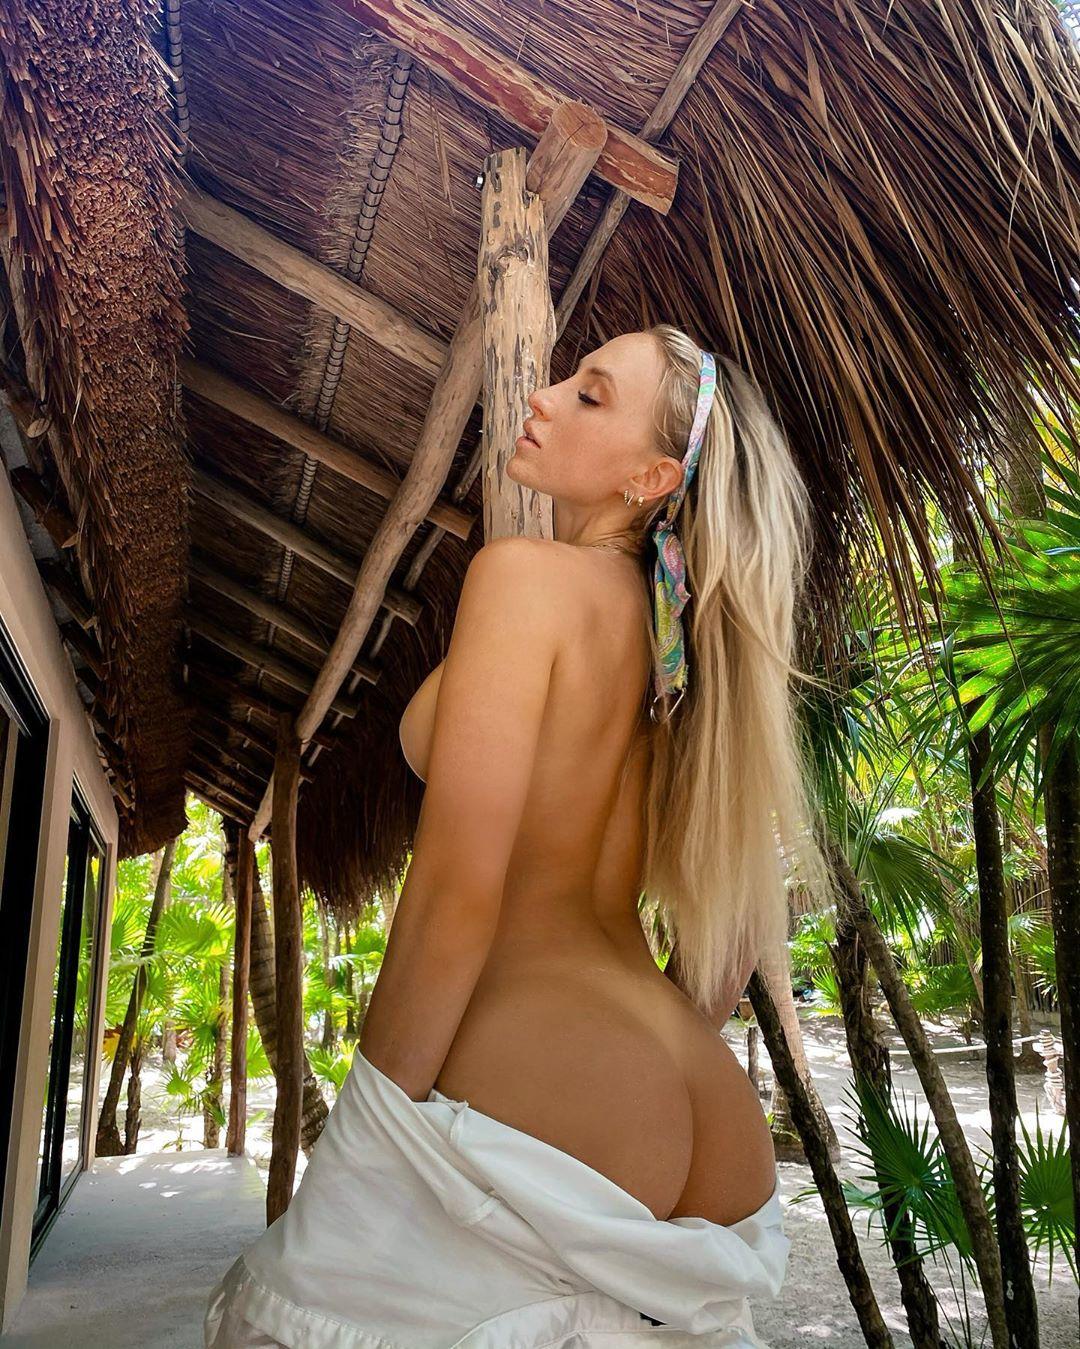 Lauren Dascalo Nude & Sex Tape Onlyfans Leaked 0012